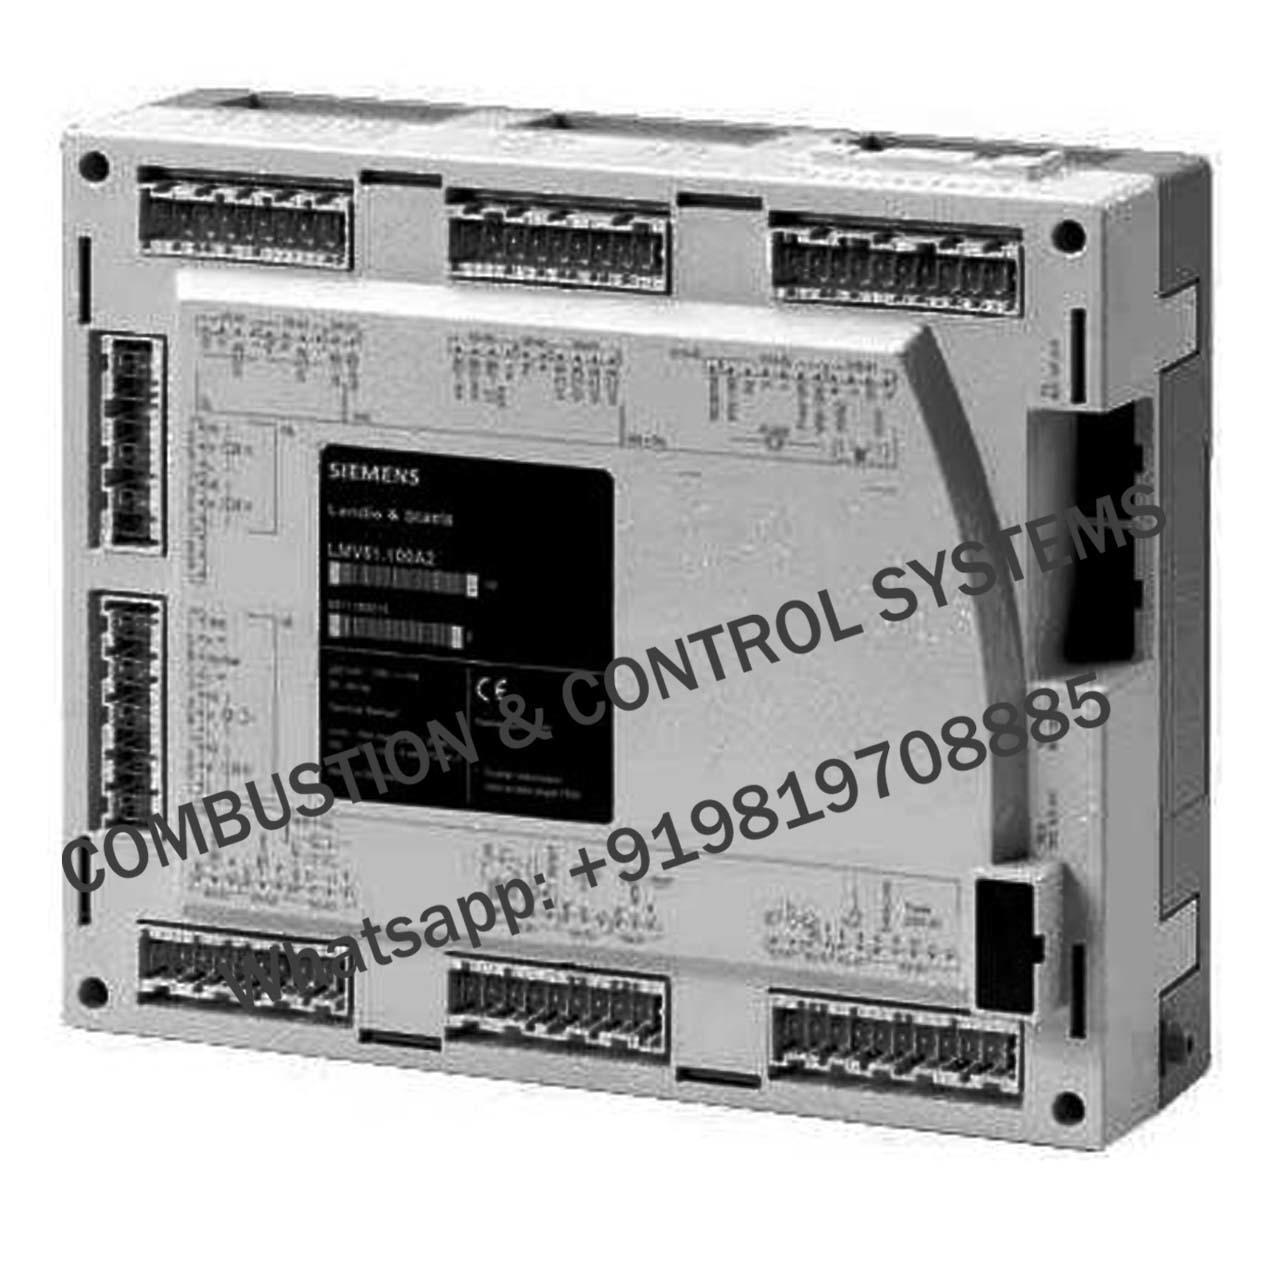 Siemens Burner Controller LMV 52